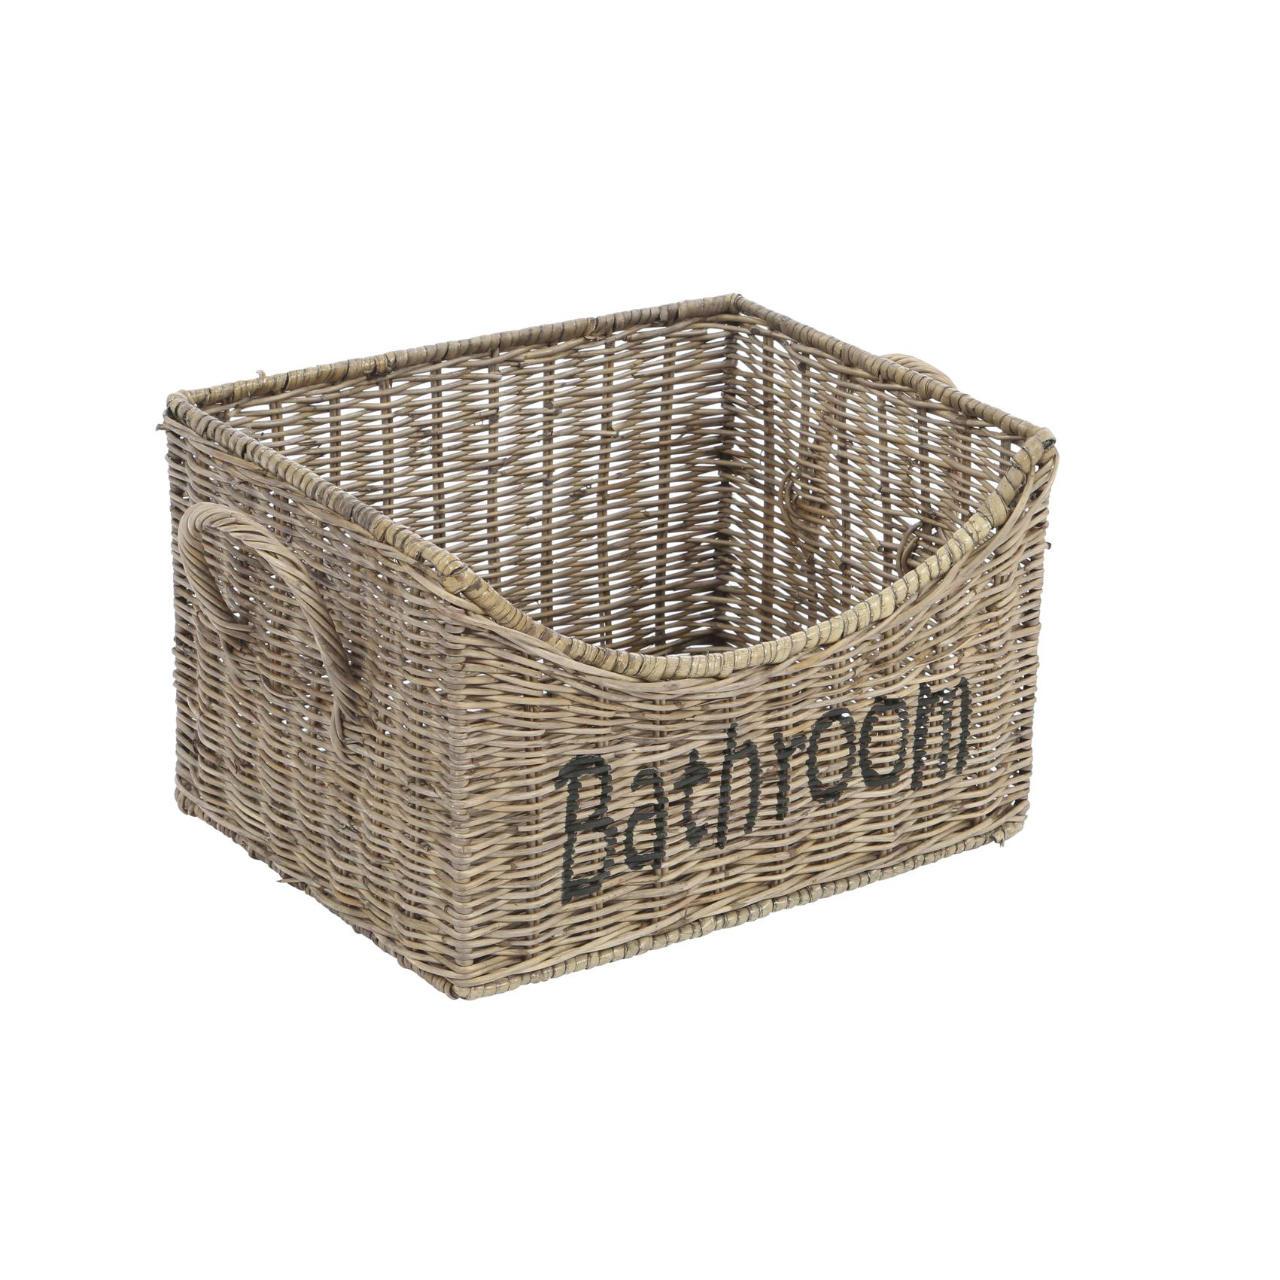 Badezimmerkorb Aufbewahrungsbox Rattan 20cm by Sweet Home & Kids